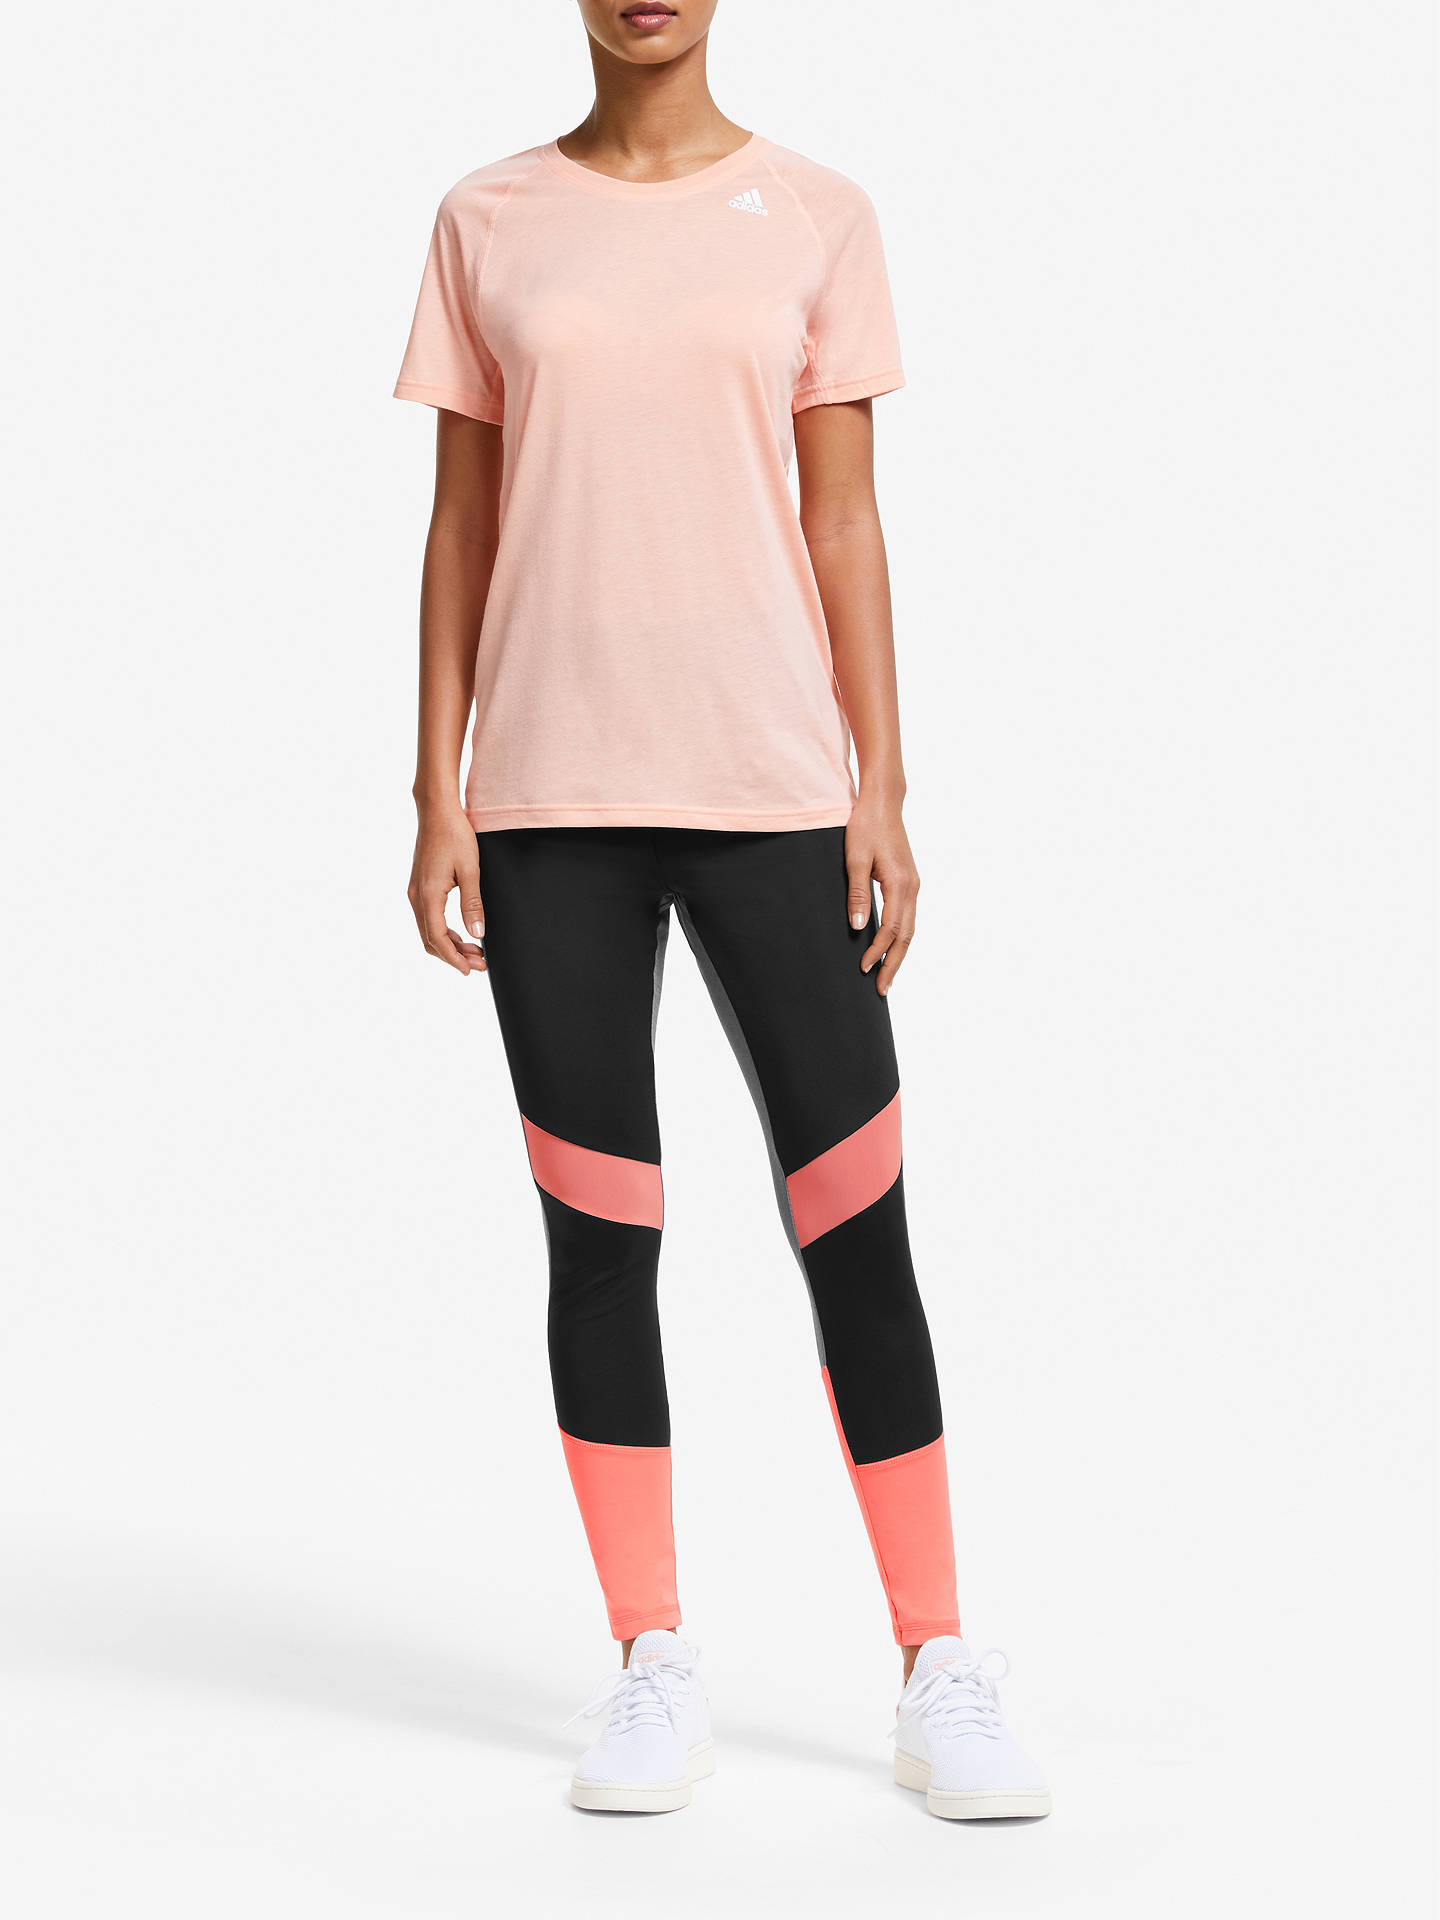 adidas sweat 7/8 sleeve coral